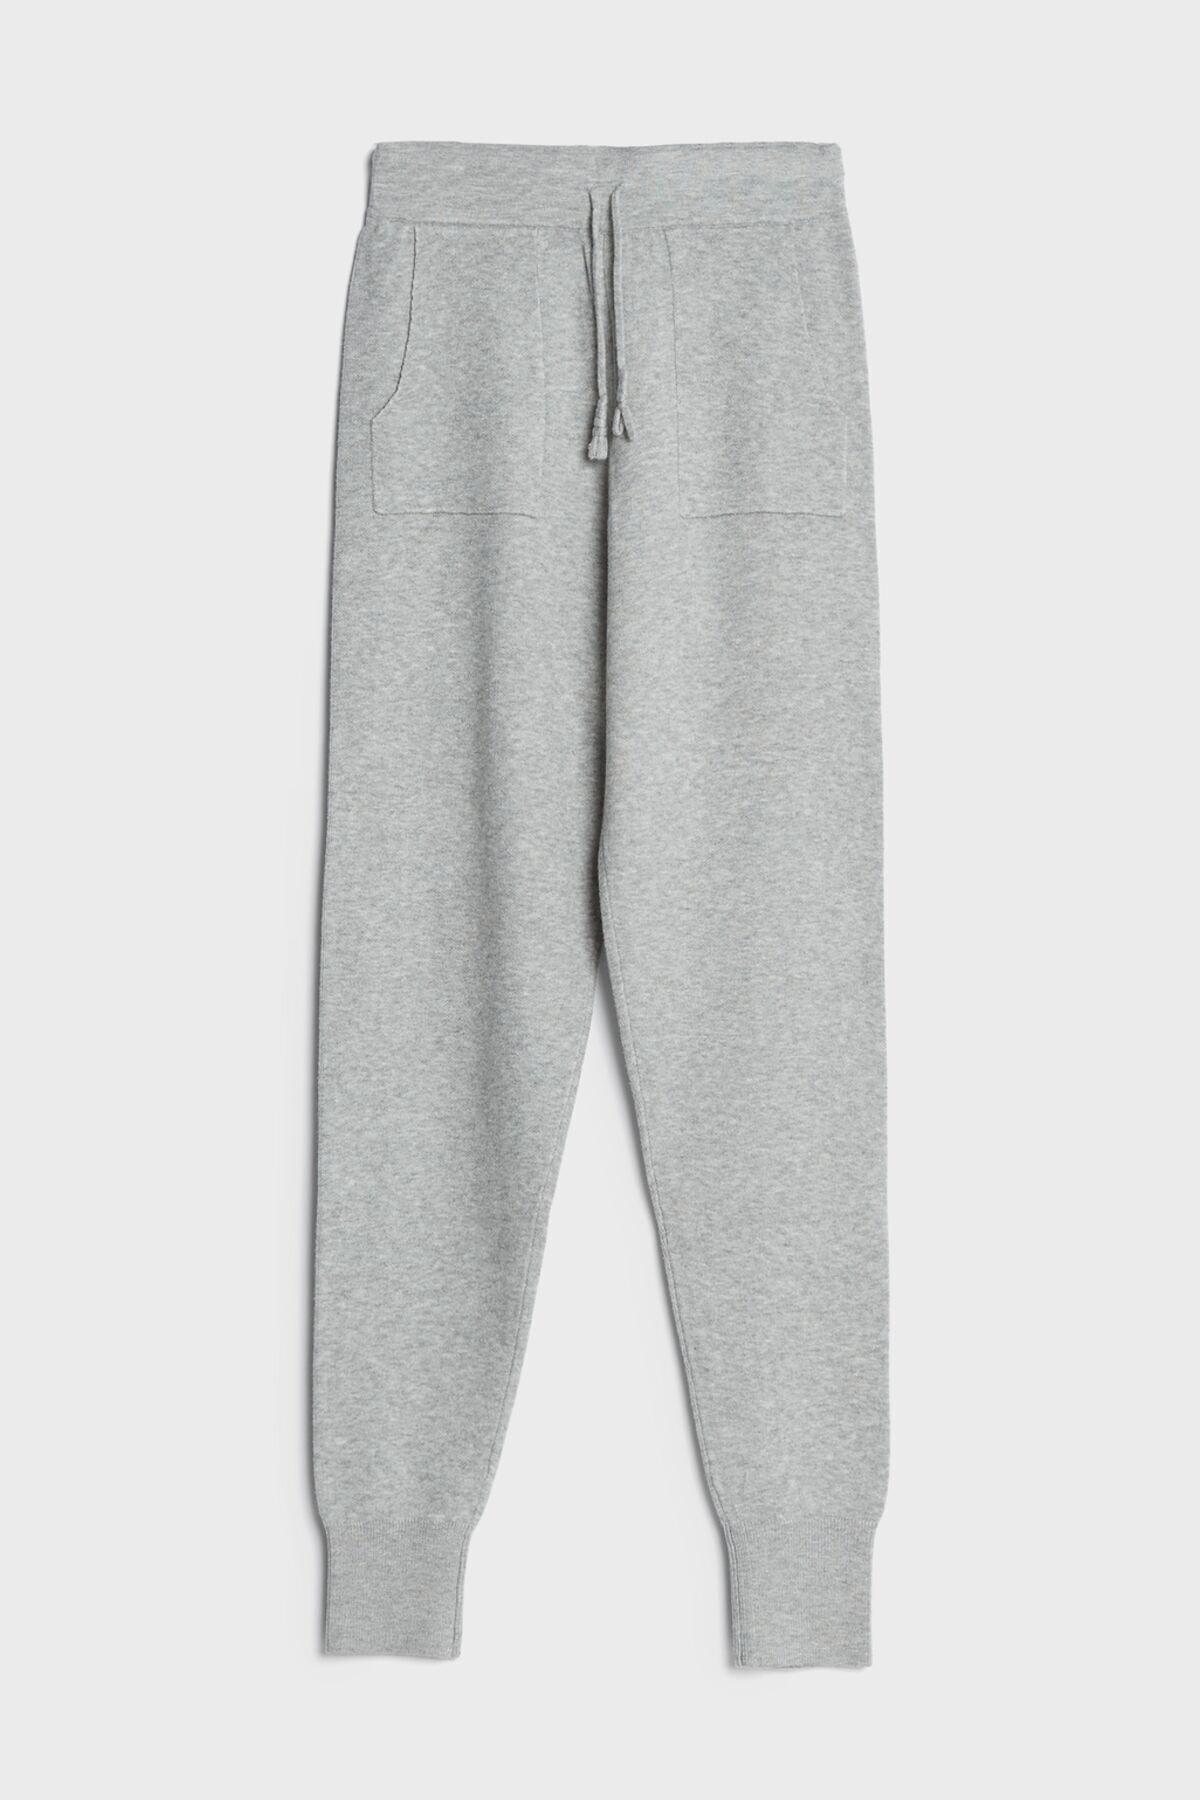 Bershka Kadın Gri Koton Jogger Pantolon 2